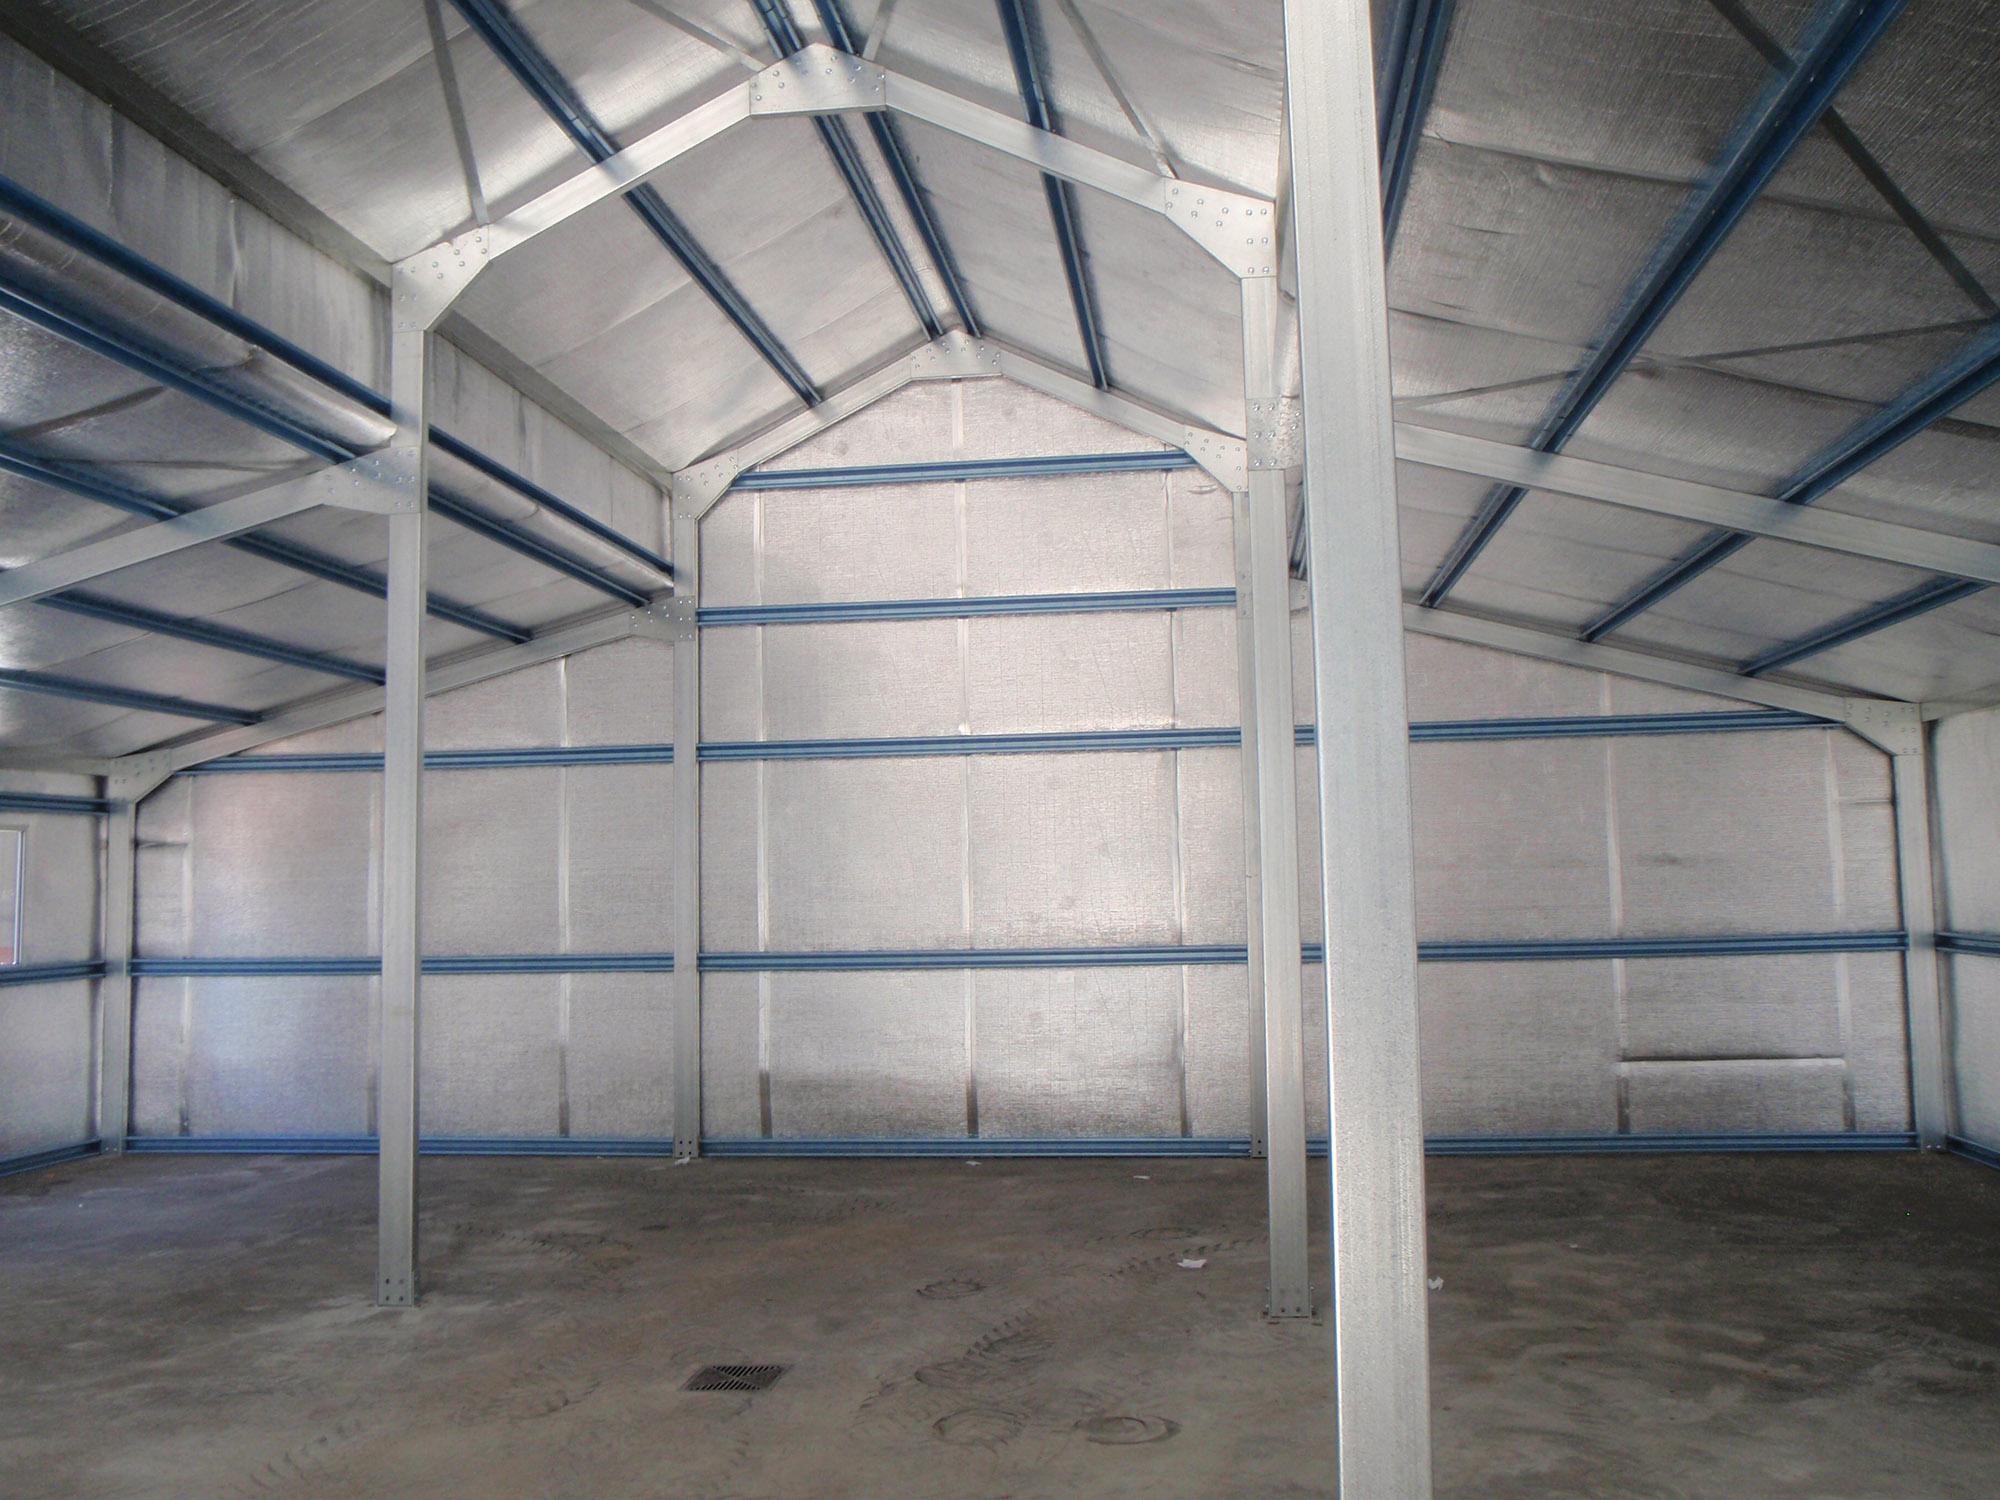 Glass_barn_insulated_12_16.jpg